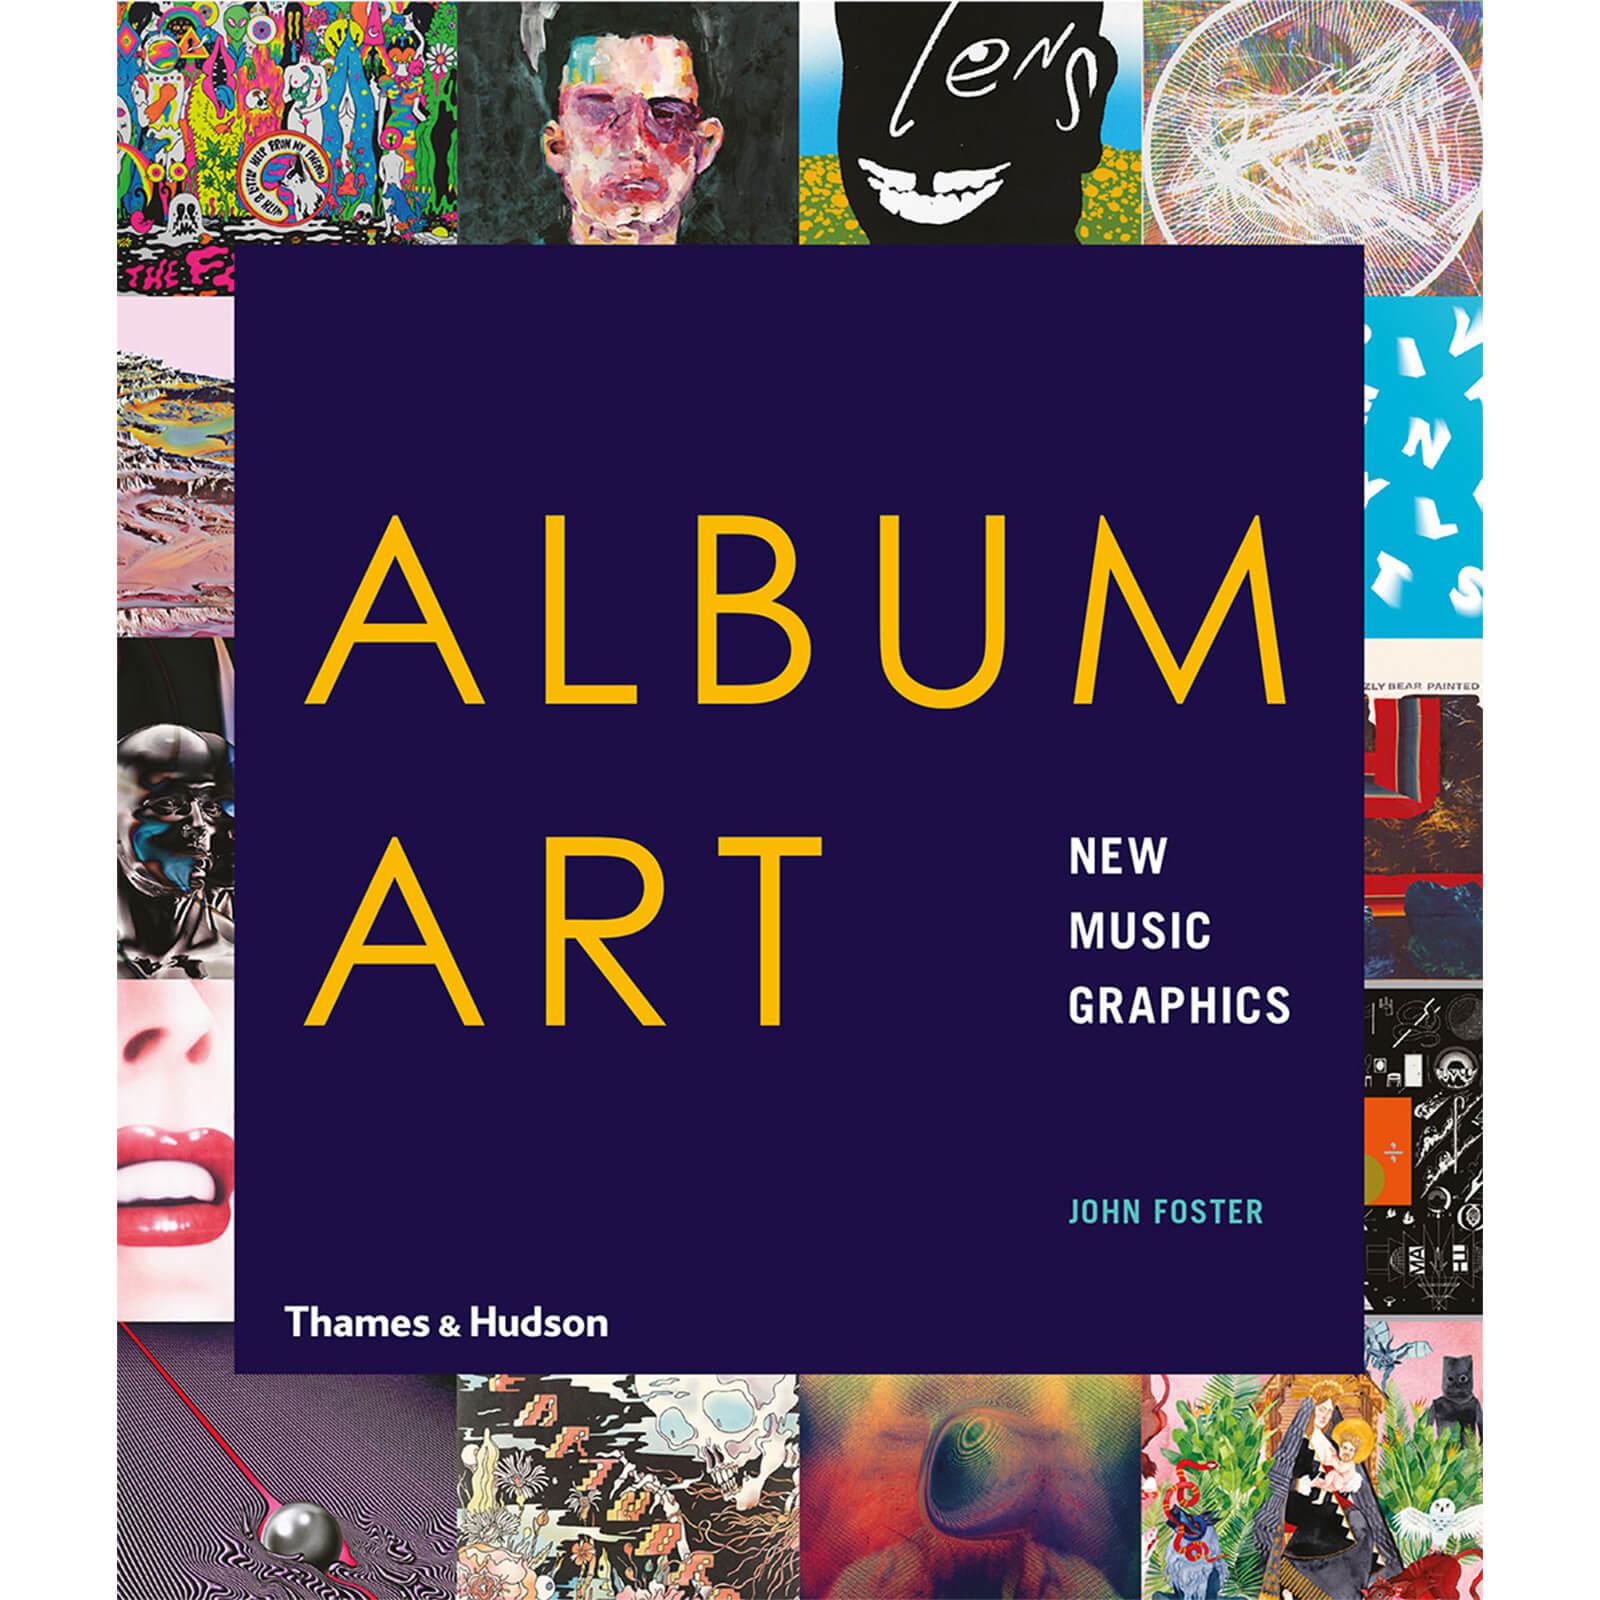 Thames and Hudson Ltd: Album Art - New Music Graphics